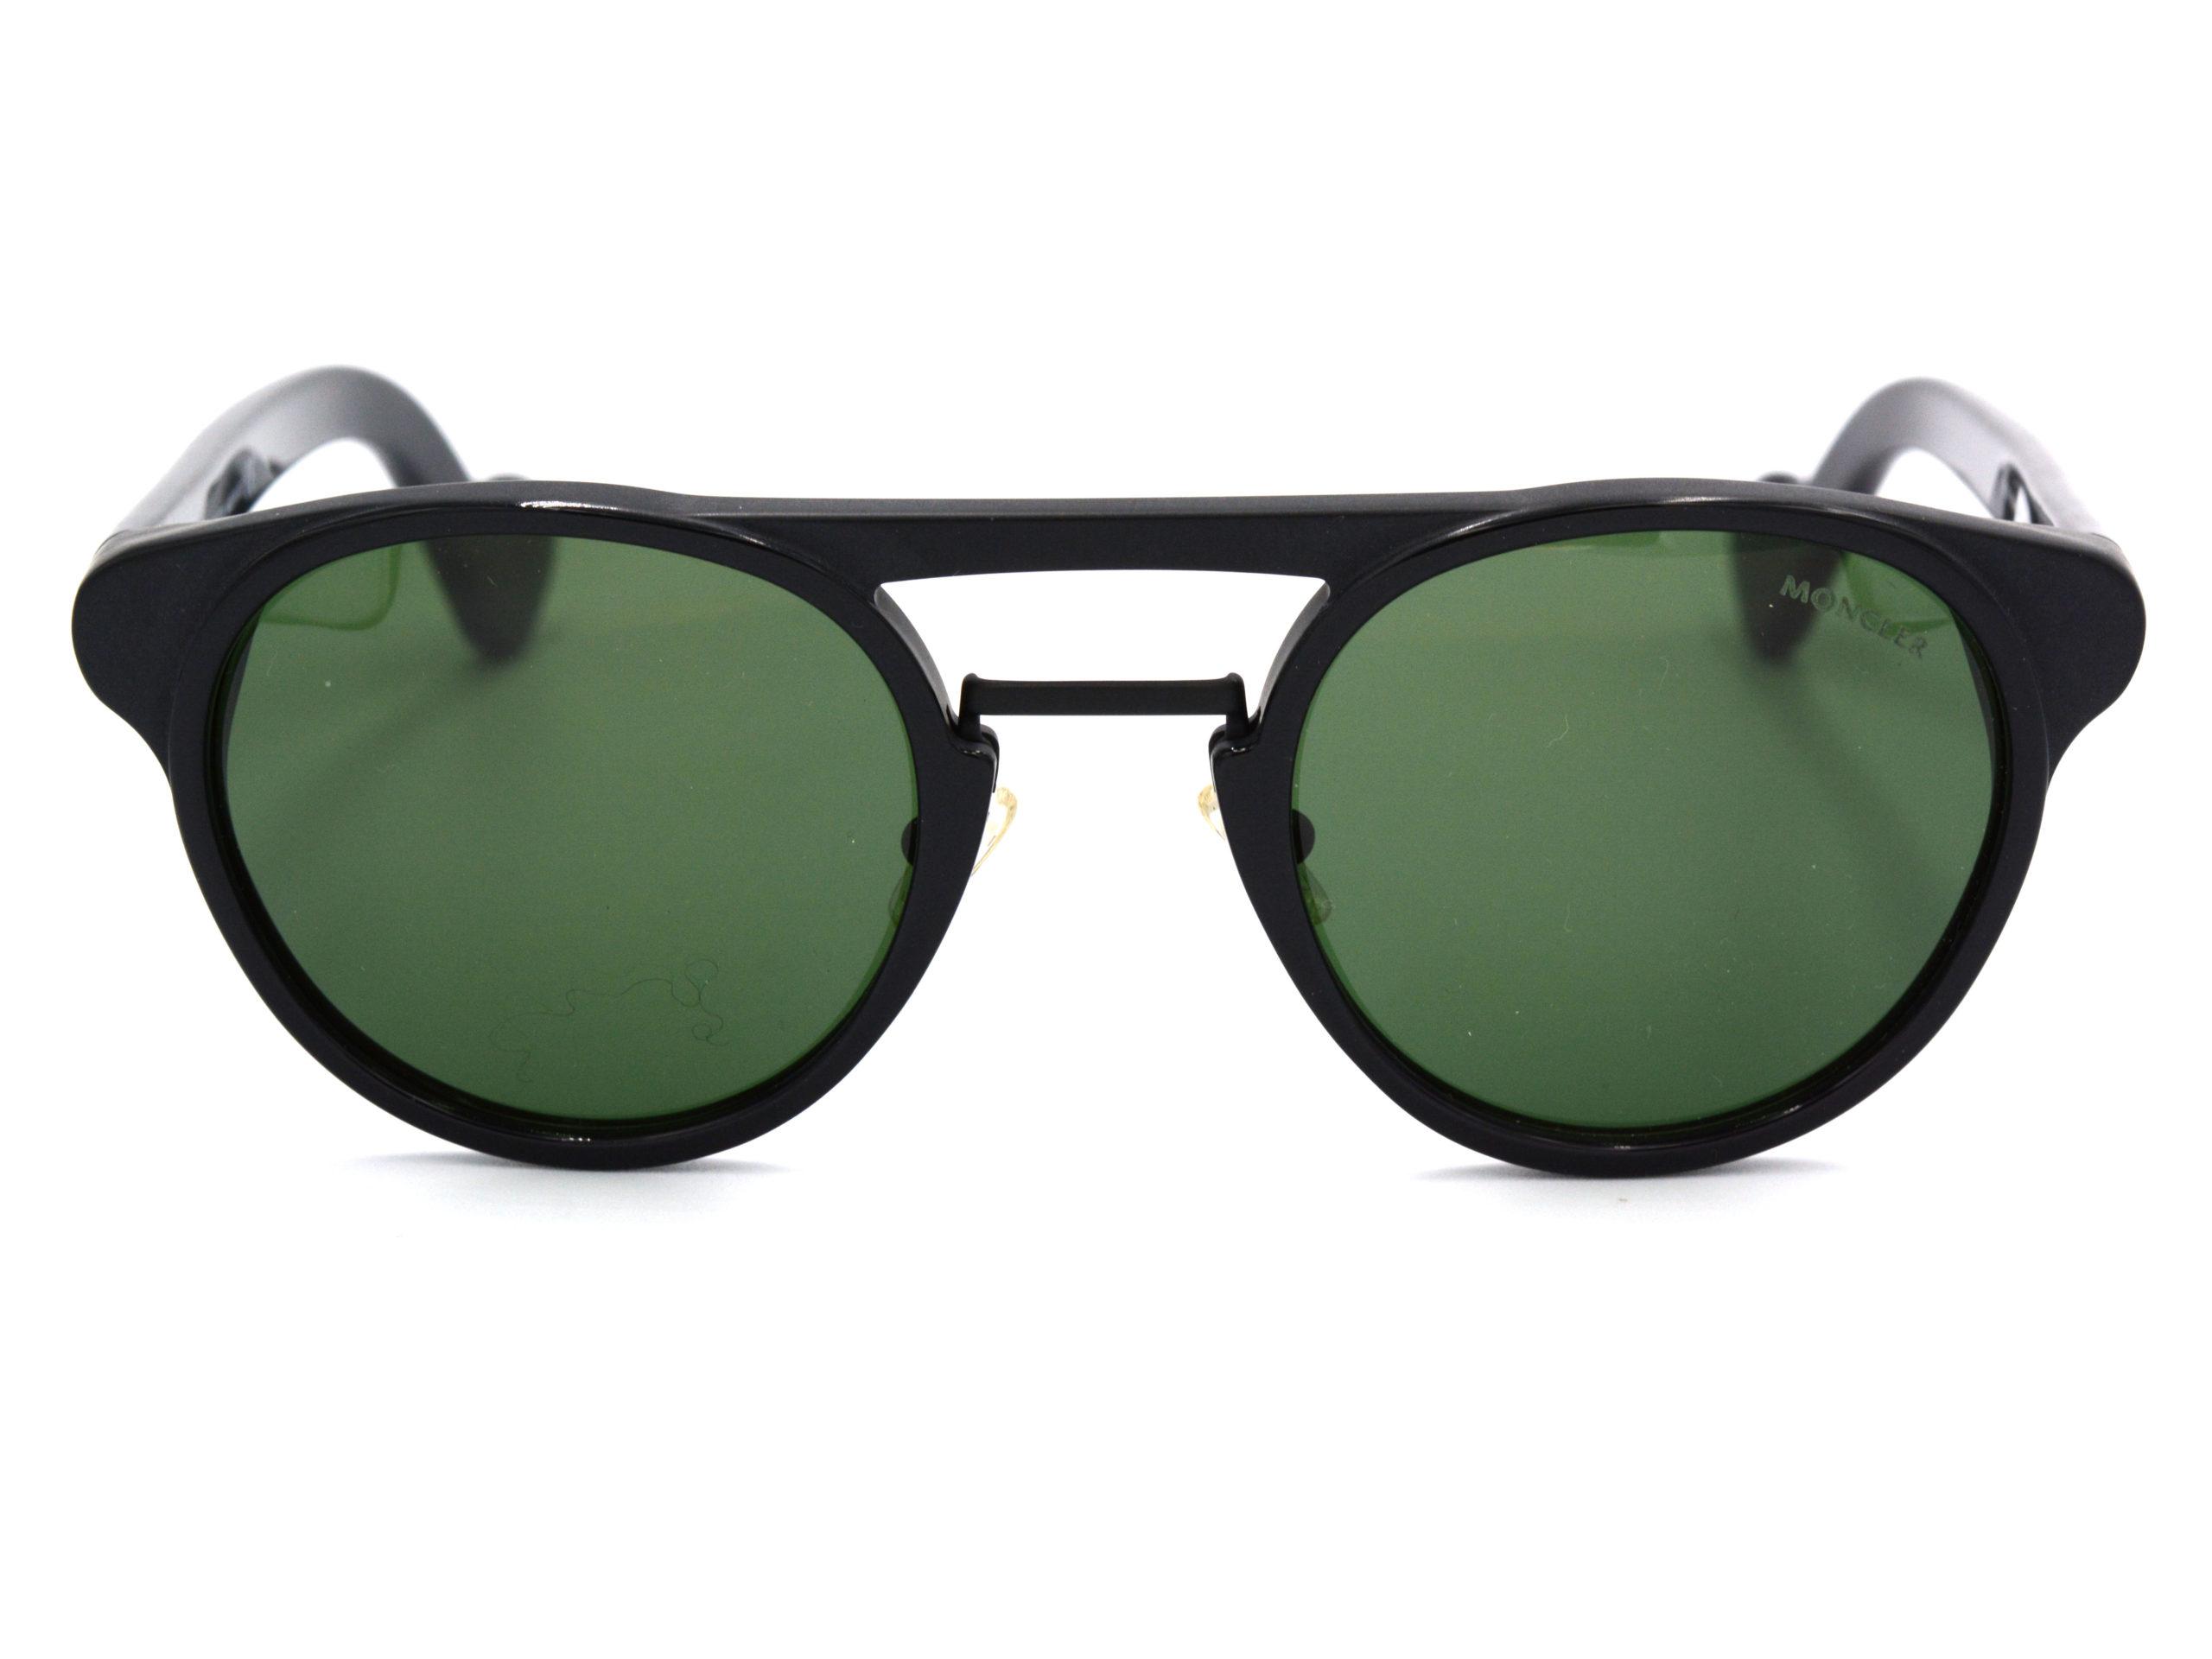 Sunglasses MONCLER ML0019 01N 50-23-145 Piraeus